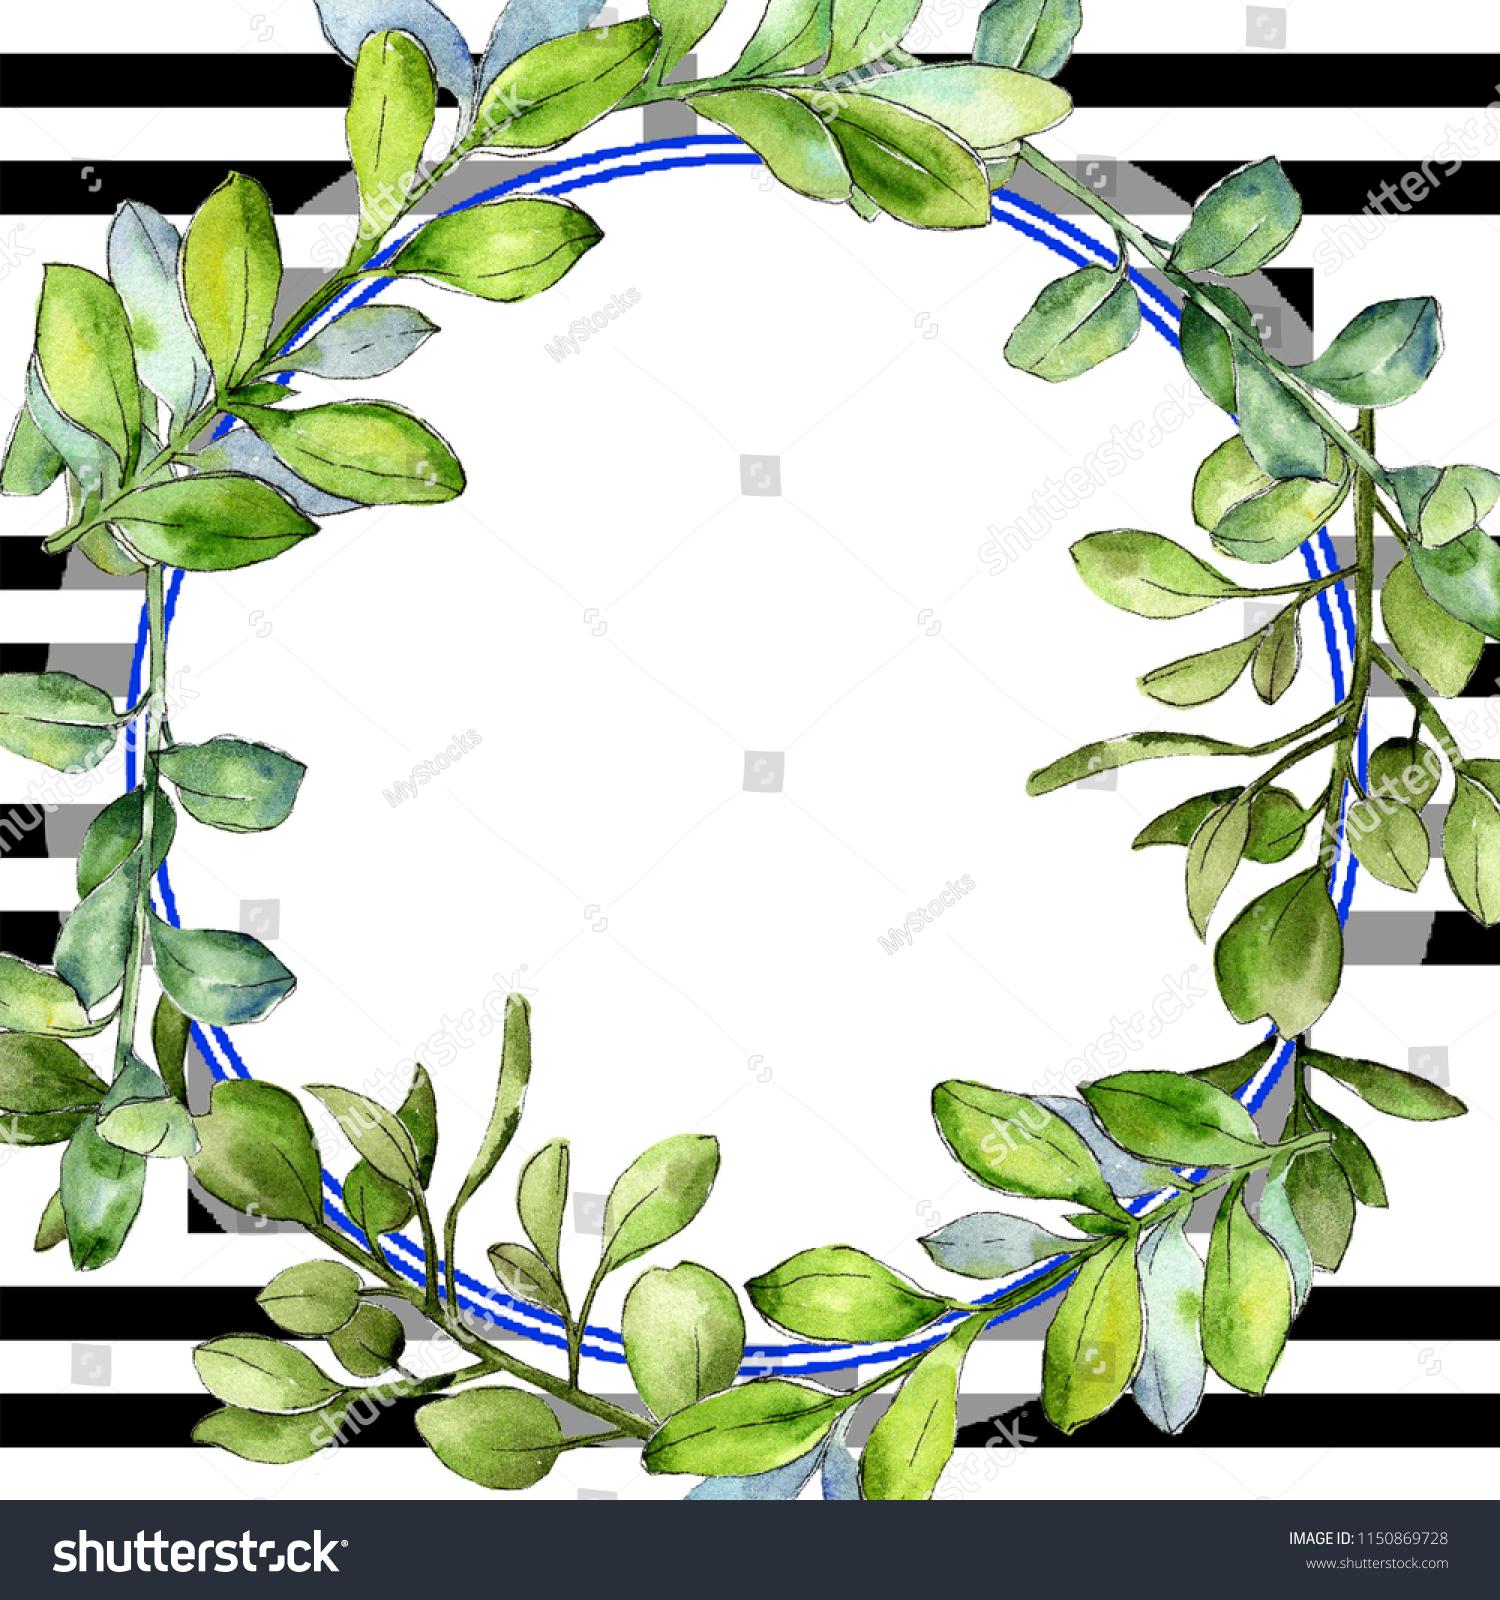 d35f533226ed Watercolor boxwood green leaf. Leaf plant botanical garden floral foliage.  Frame border ornament square